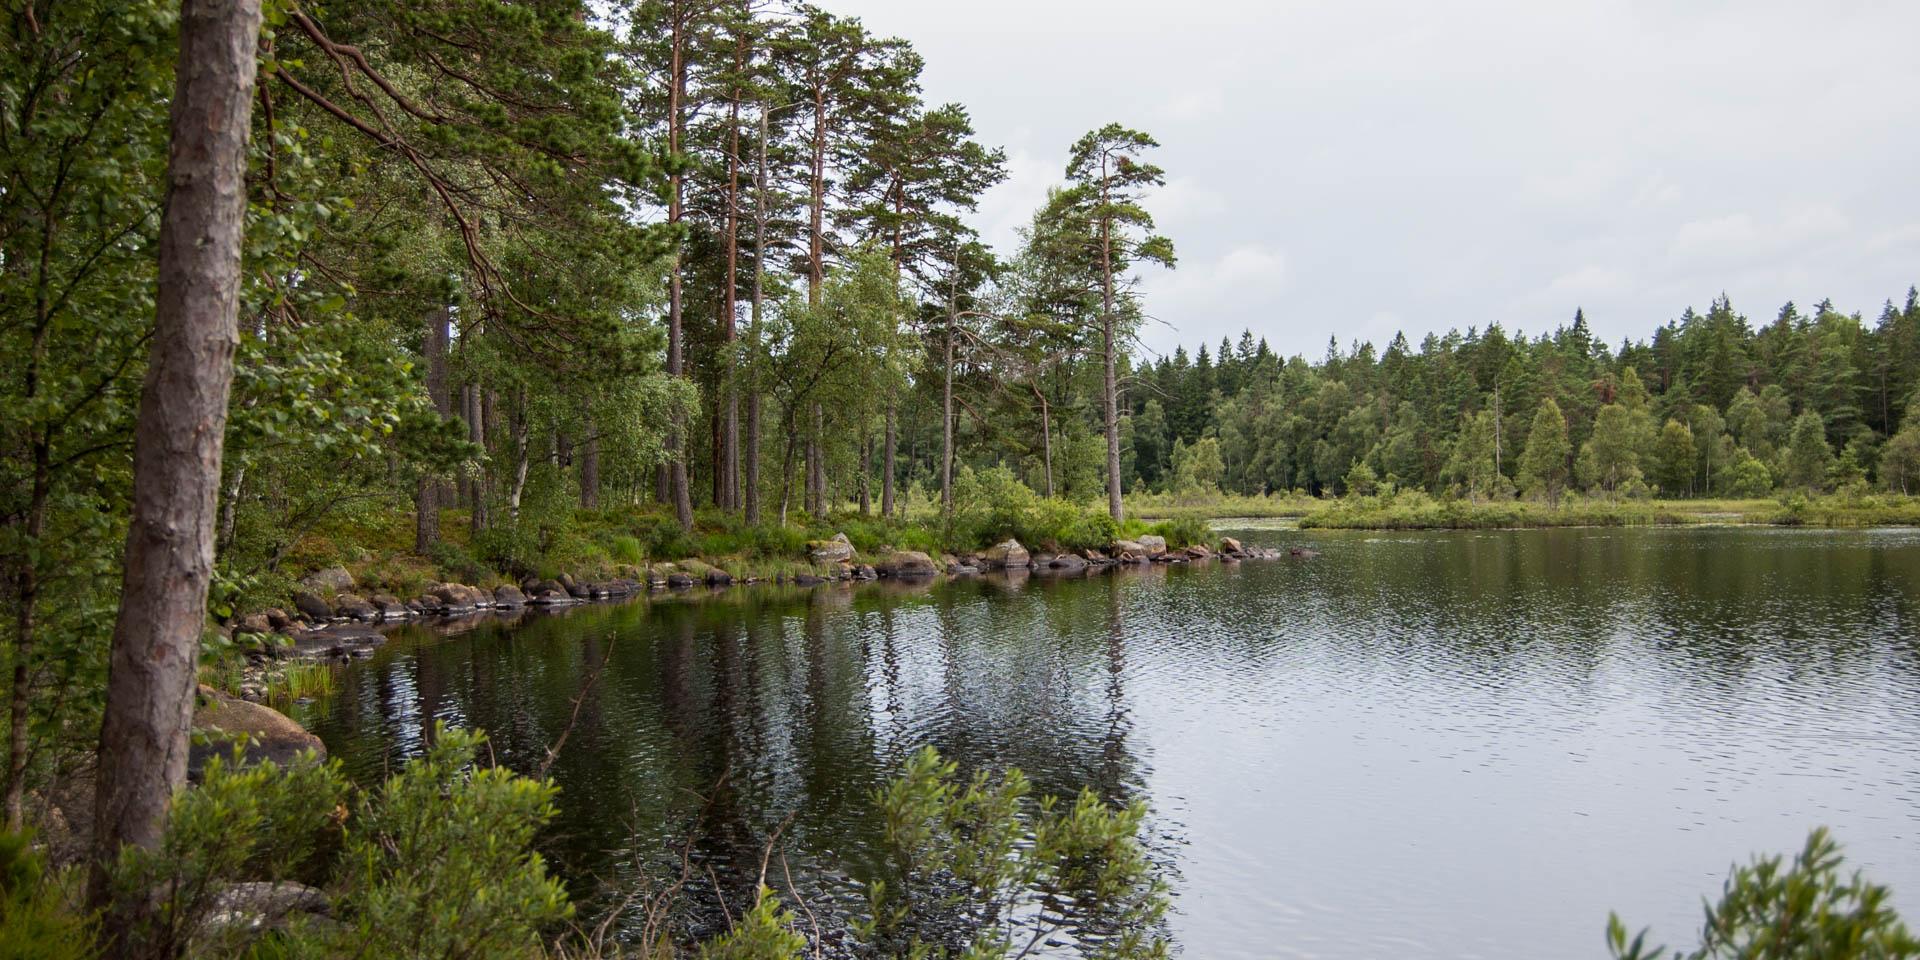 Visjön Naturreservat 2015